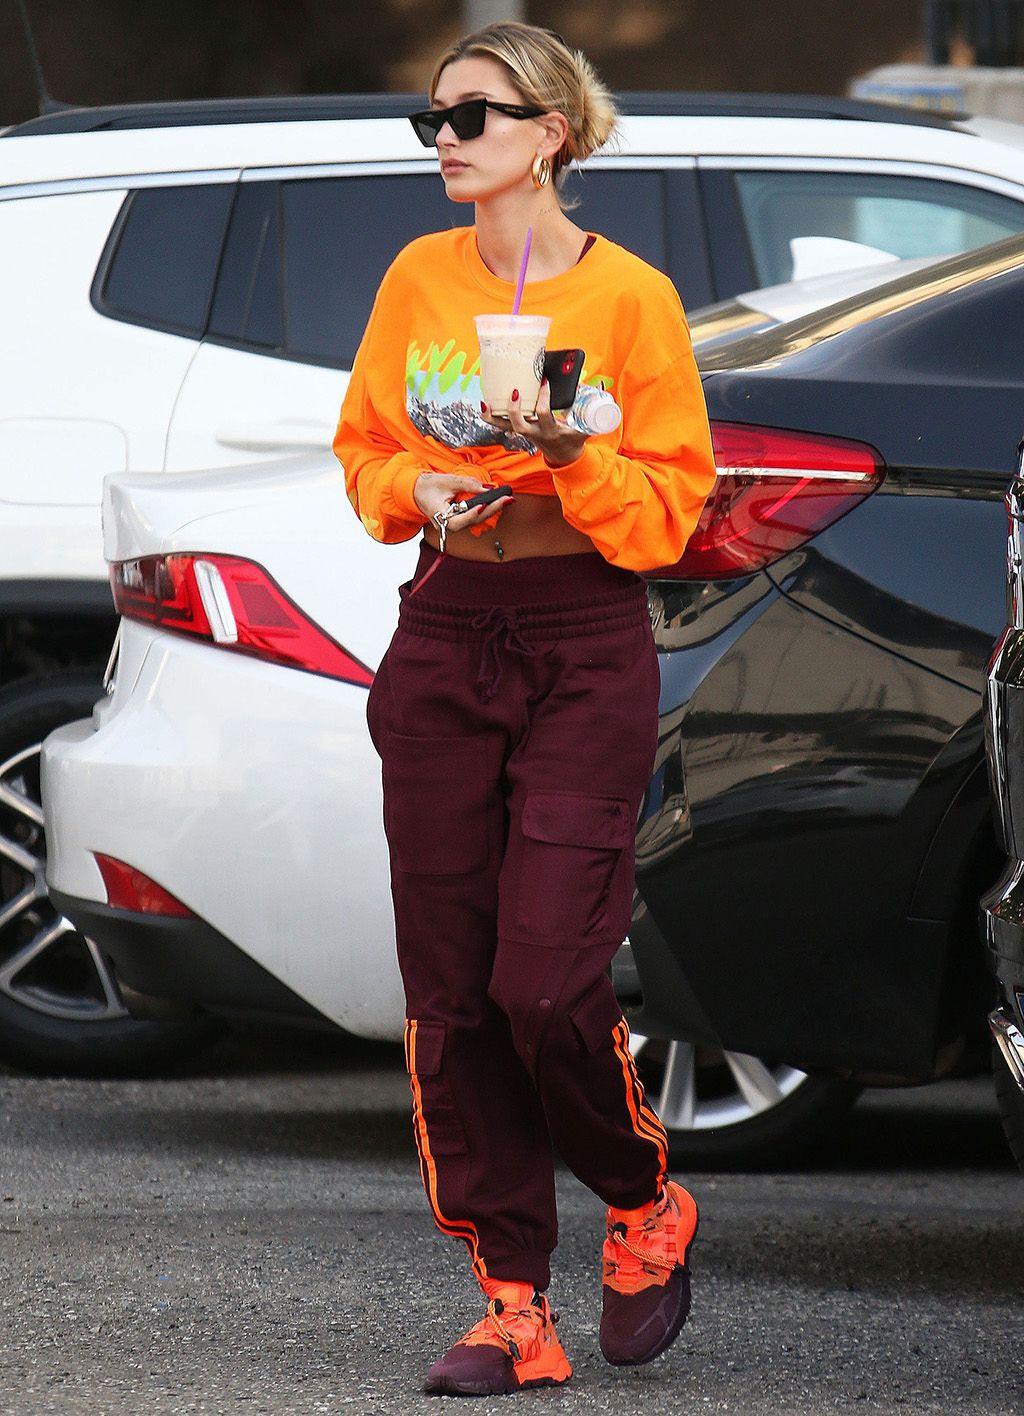 hailey baldwin bieber măc áo crop top quần tracksuit theo phong cách thời trang athleisure